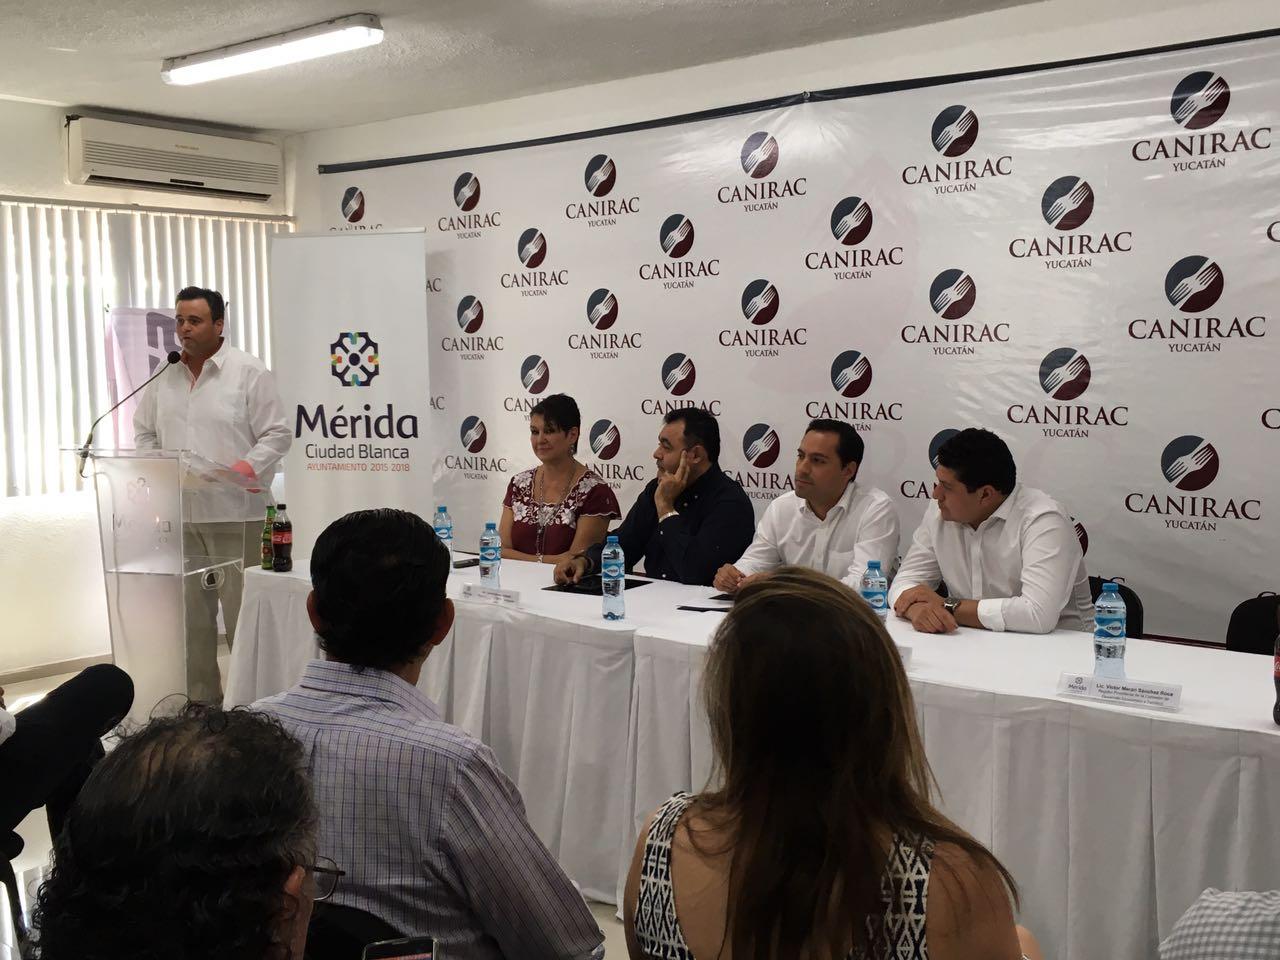 Arrasó en Mérida la Semana del Restaurante